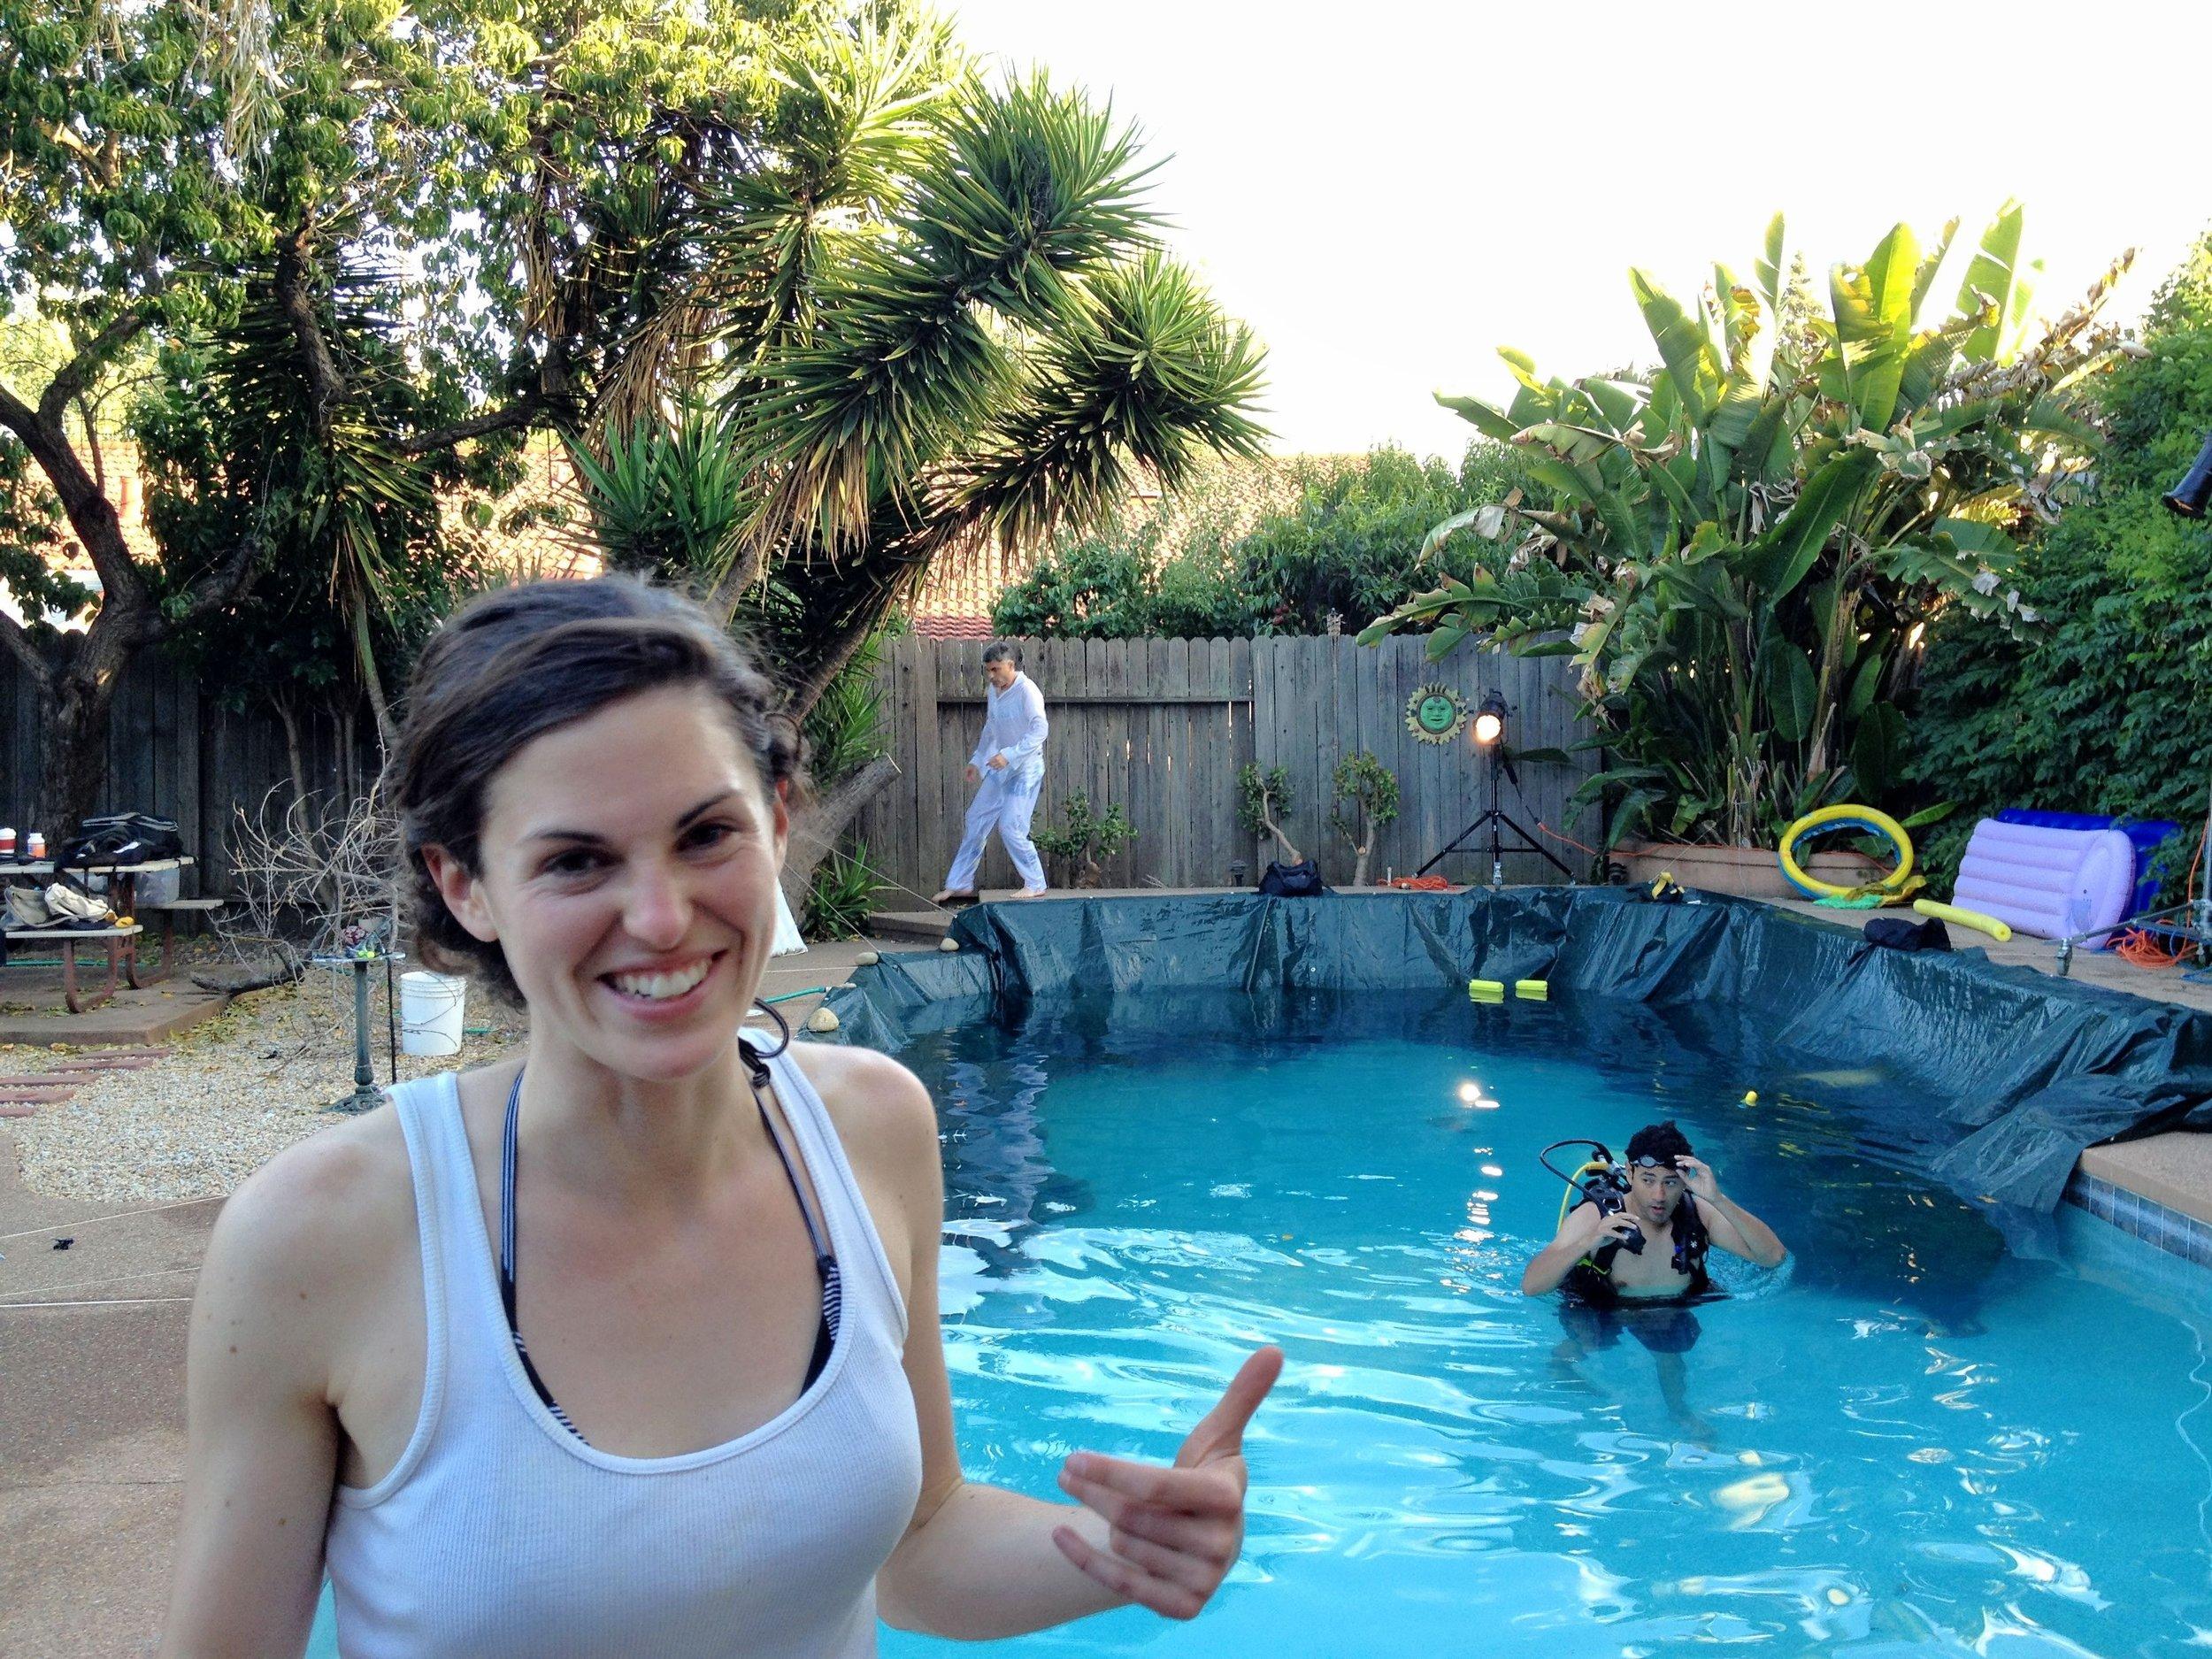 AD Katie McFadden, Director Alex Vargas and underwater Cam Op Julio Menard setting up for a night shoot.